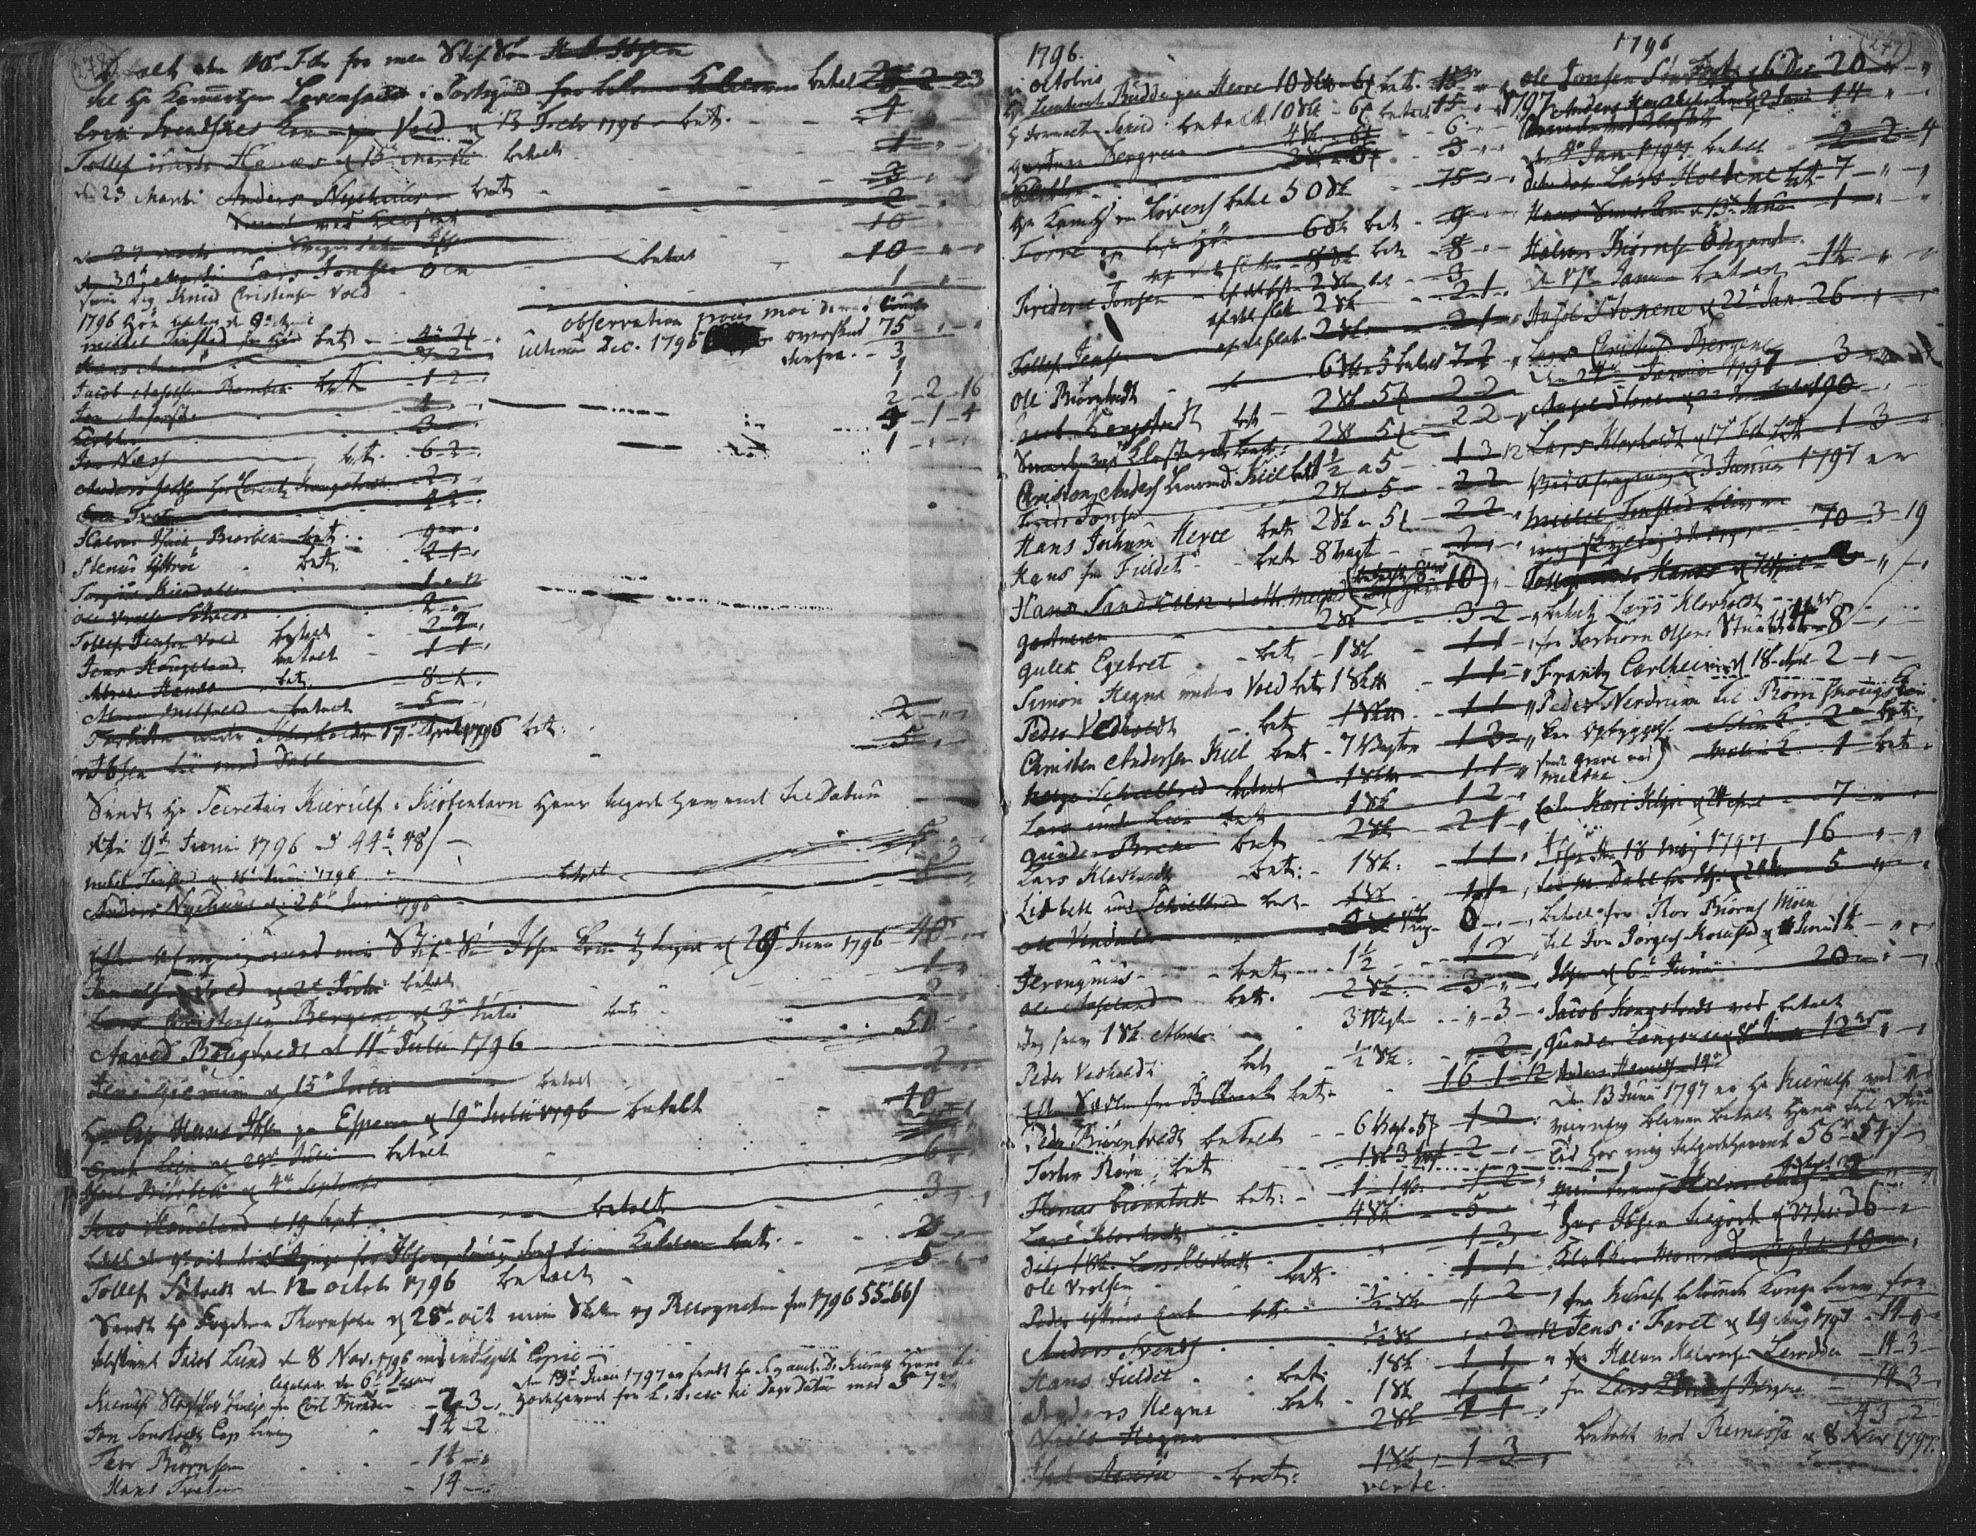 SAKO, Solum kirkebøker, F/Fa/L0003: Ministerialbok nr. I 3, 1761-1814, s. 278-279